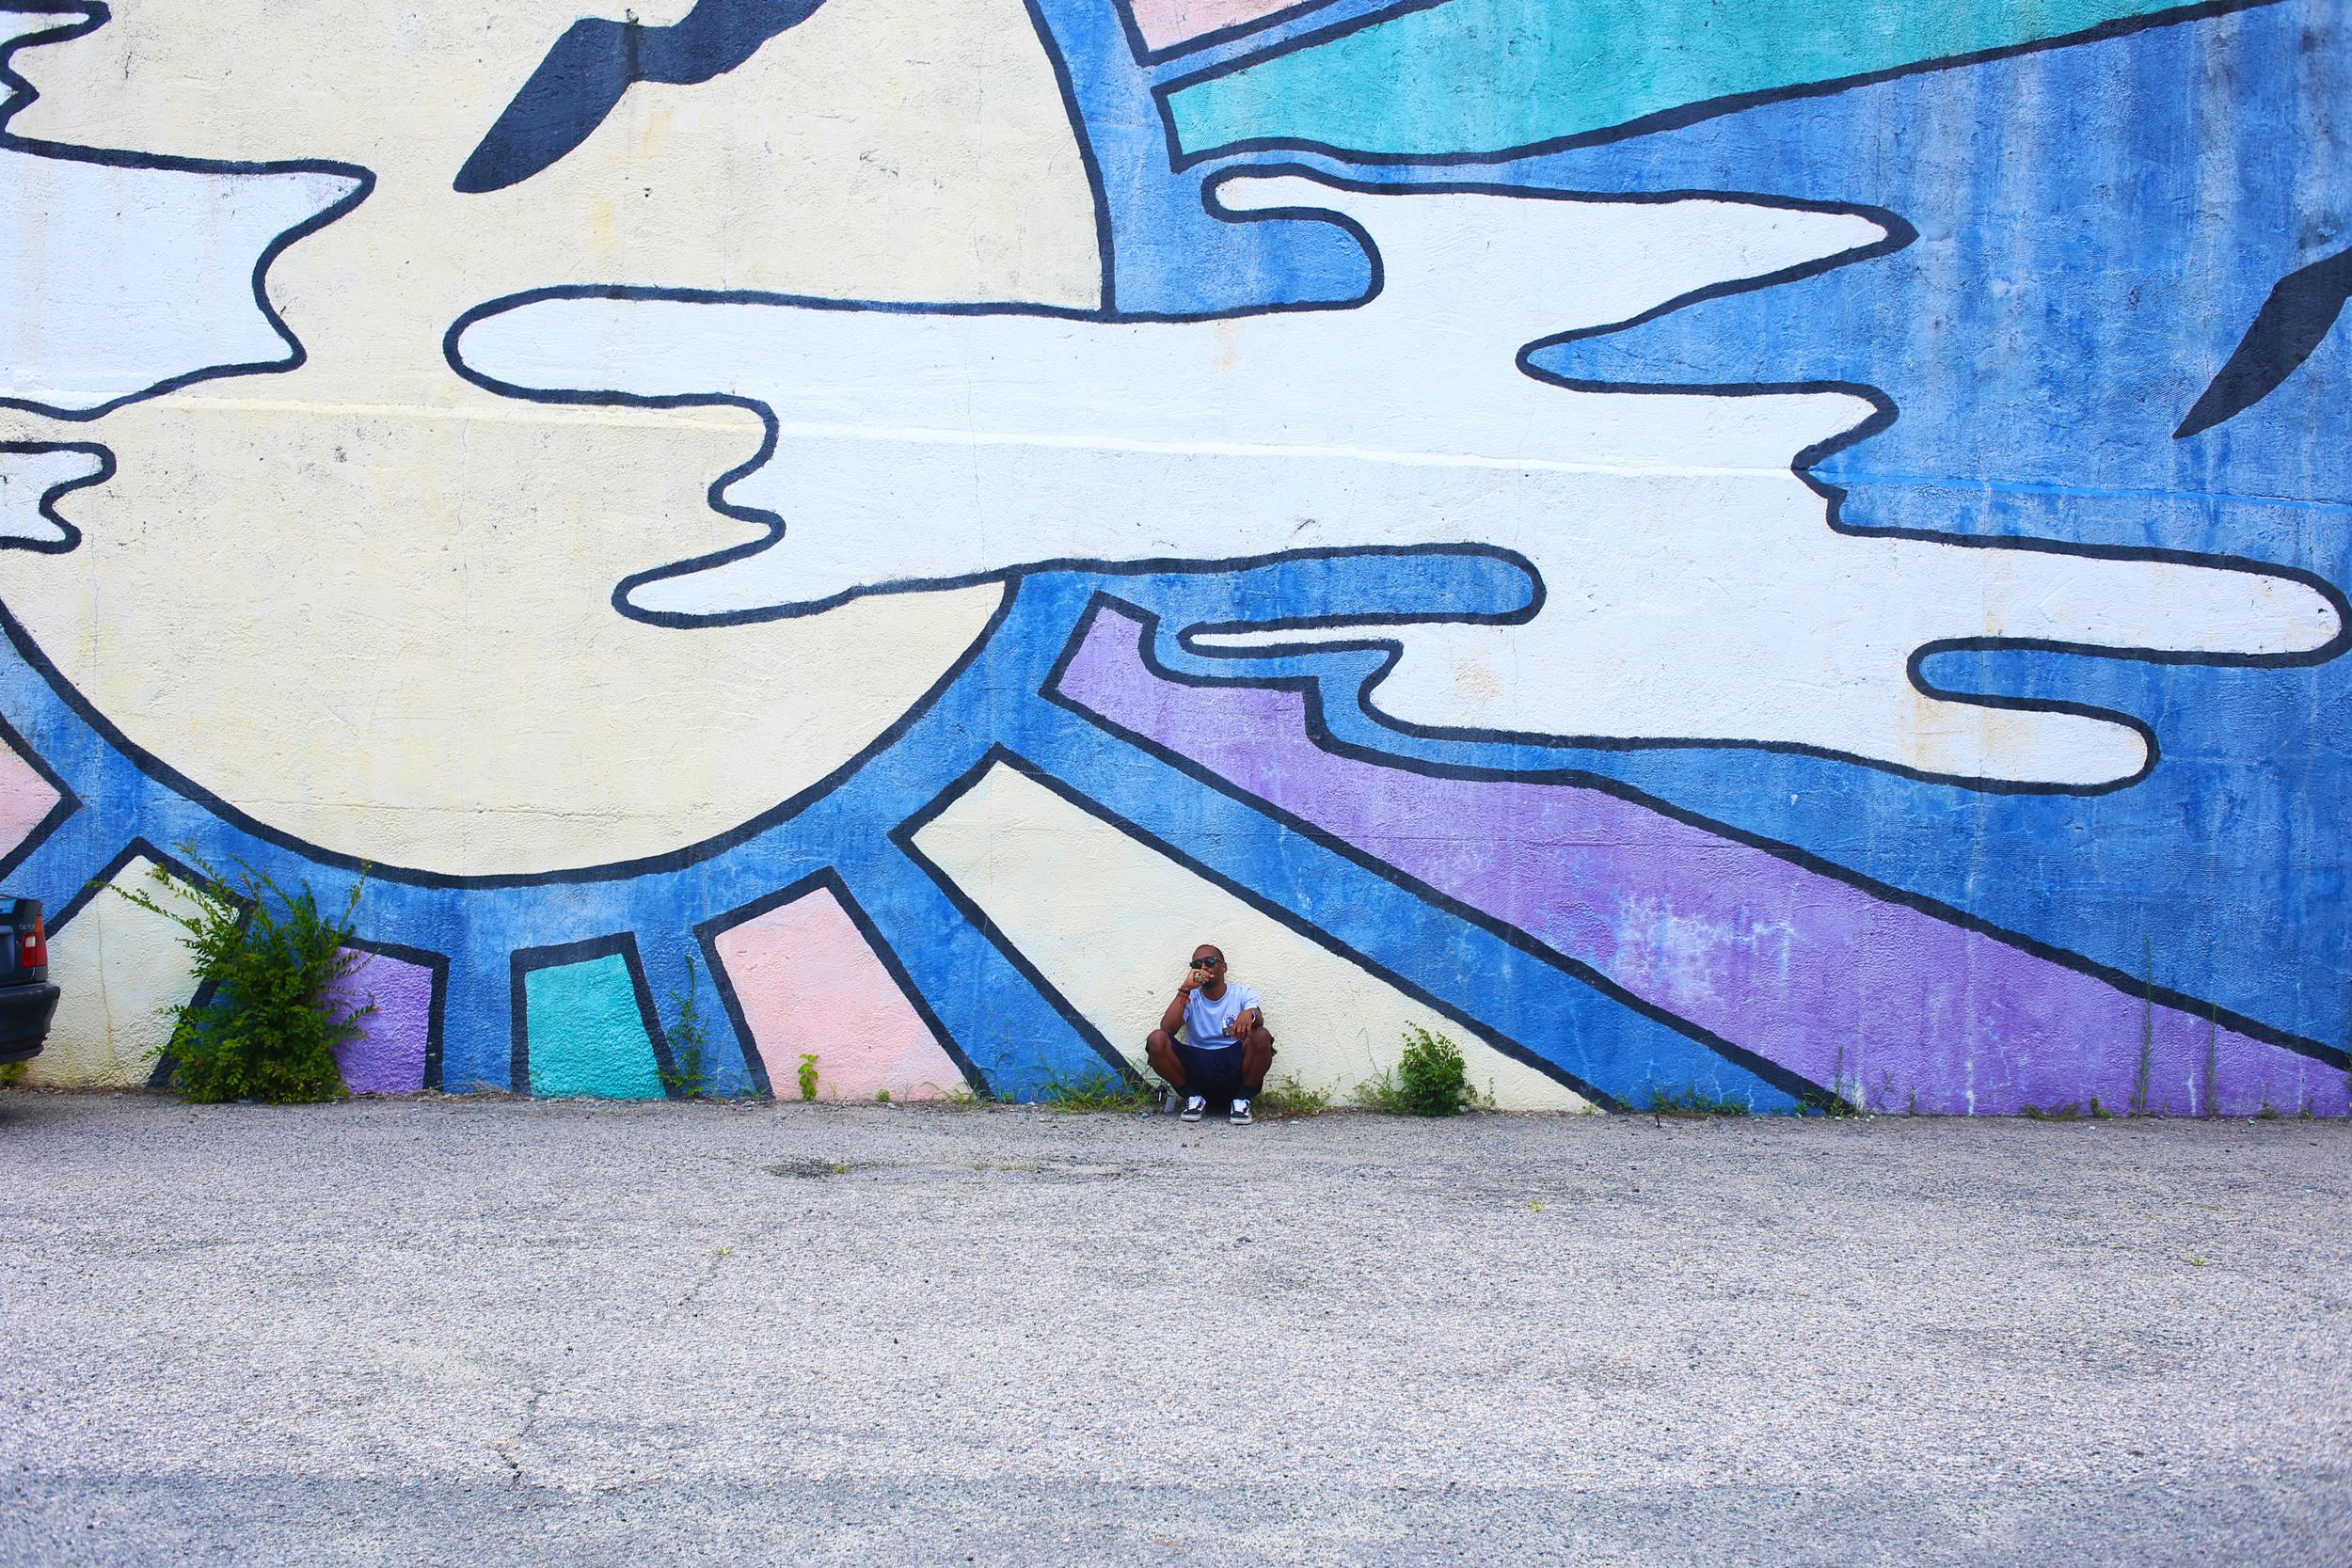 Street art in Downtown Durham, NC.